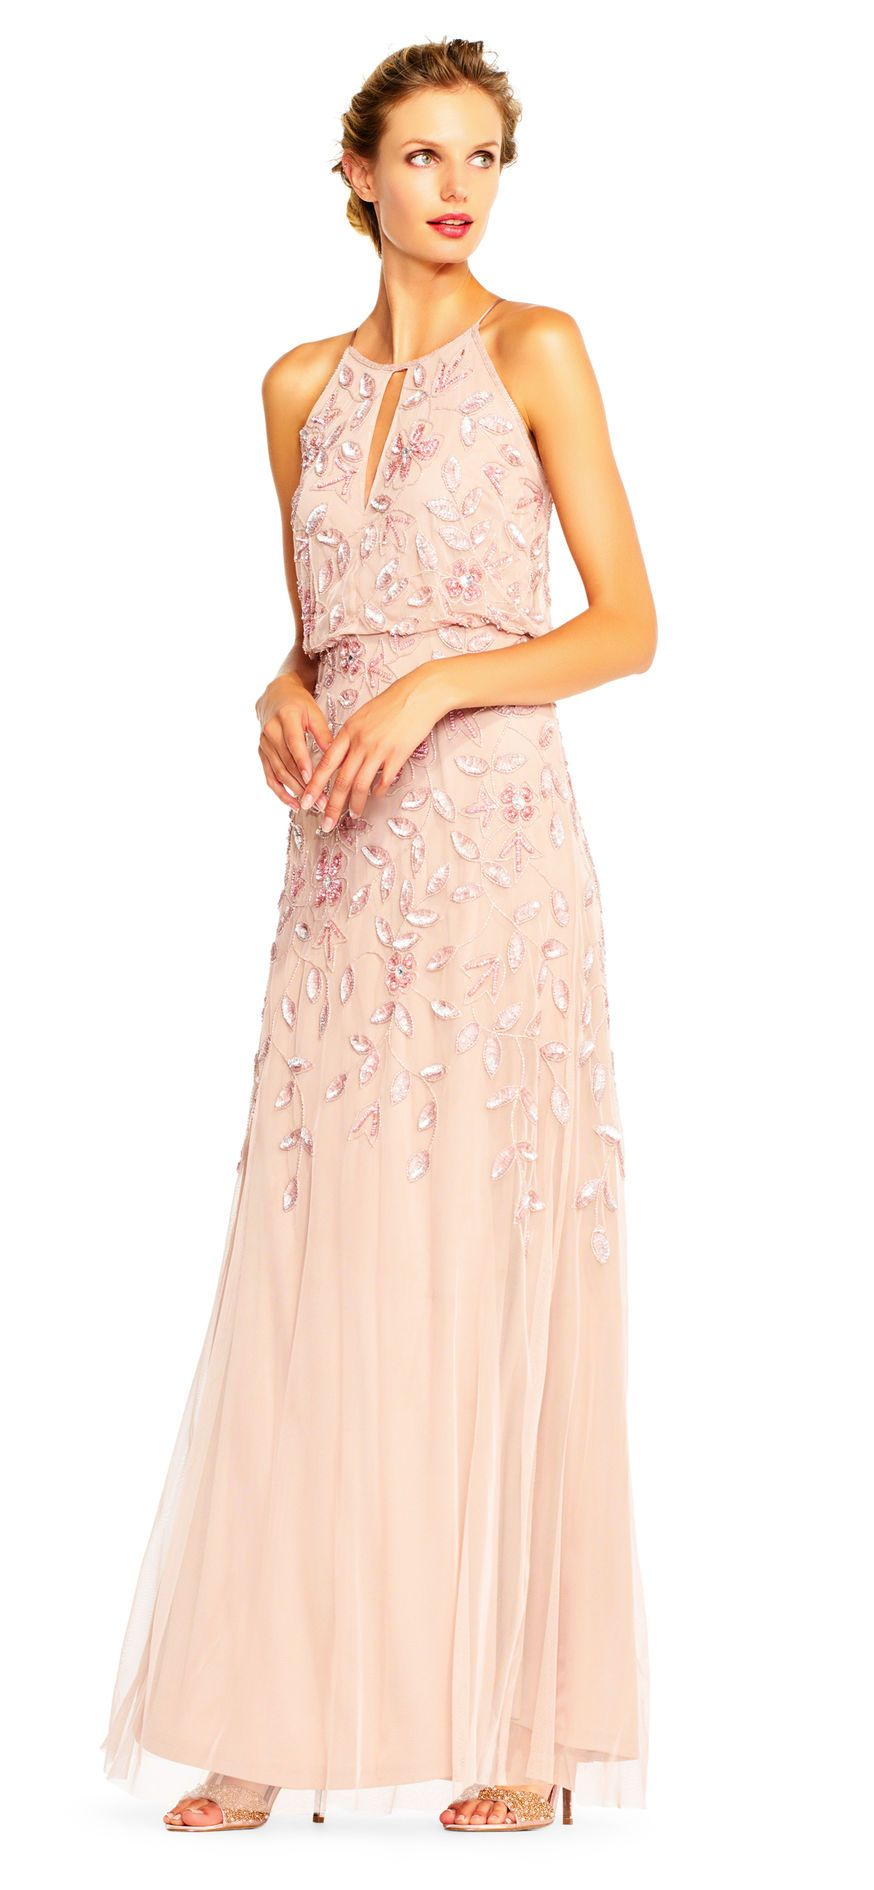 Floral Beaded Blouson Halter Gown   Pinterest   Halter gown ...